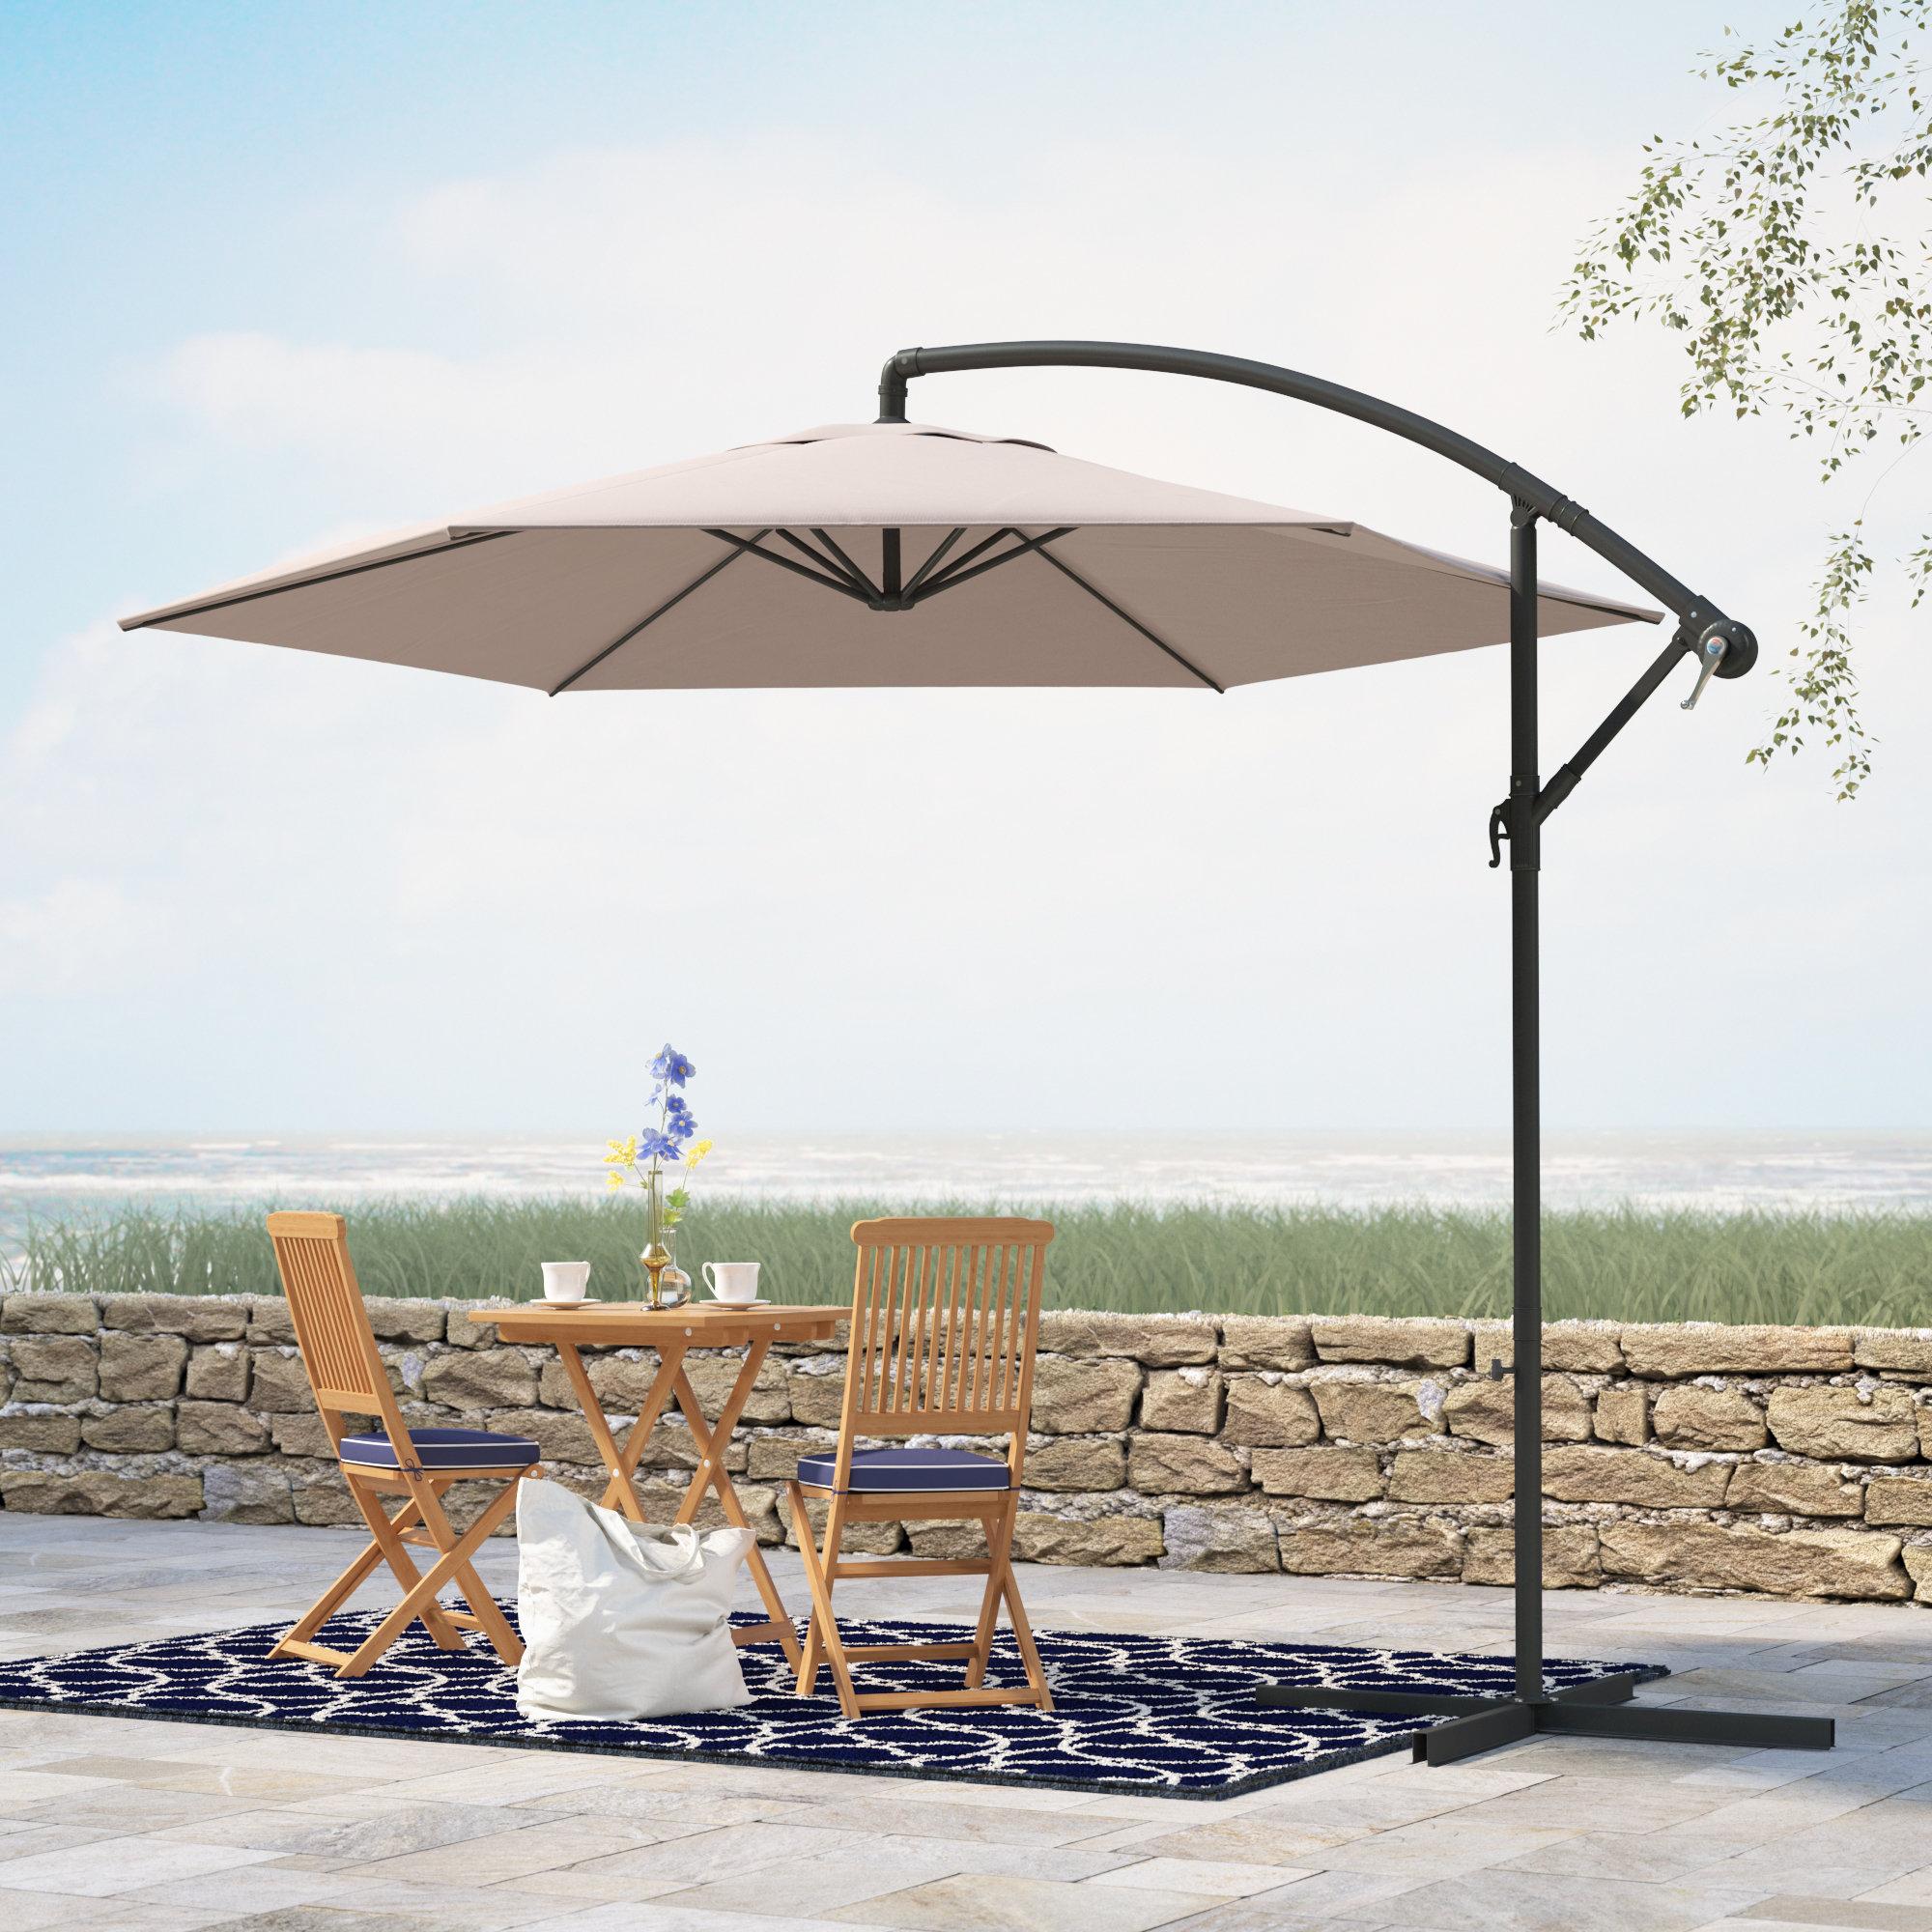 Iyanna Cantilever Umbrellas With Regard To Trendy Alyssa 10' Cantilever Umbrella (View 11 of 20)